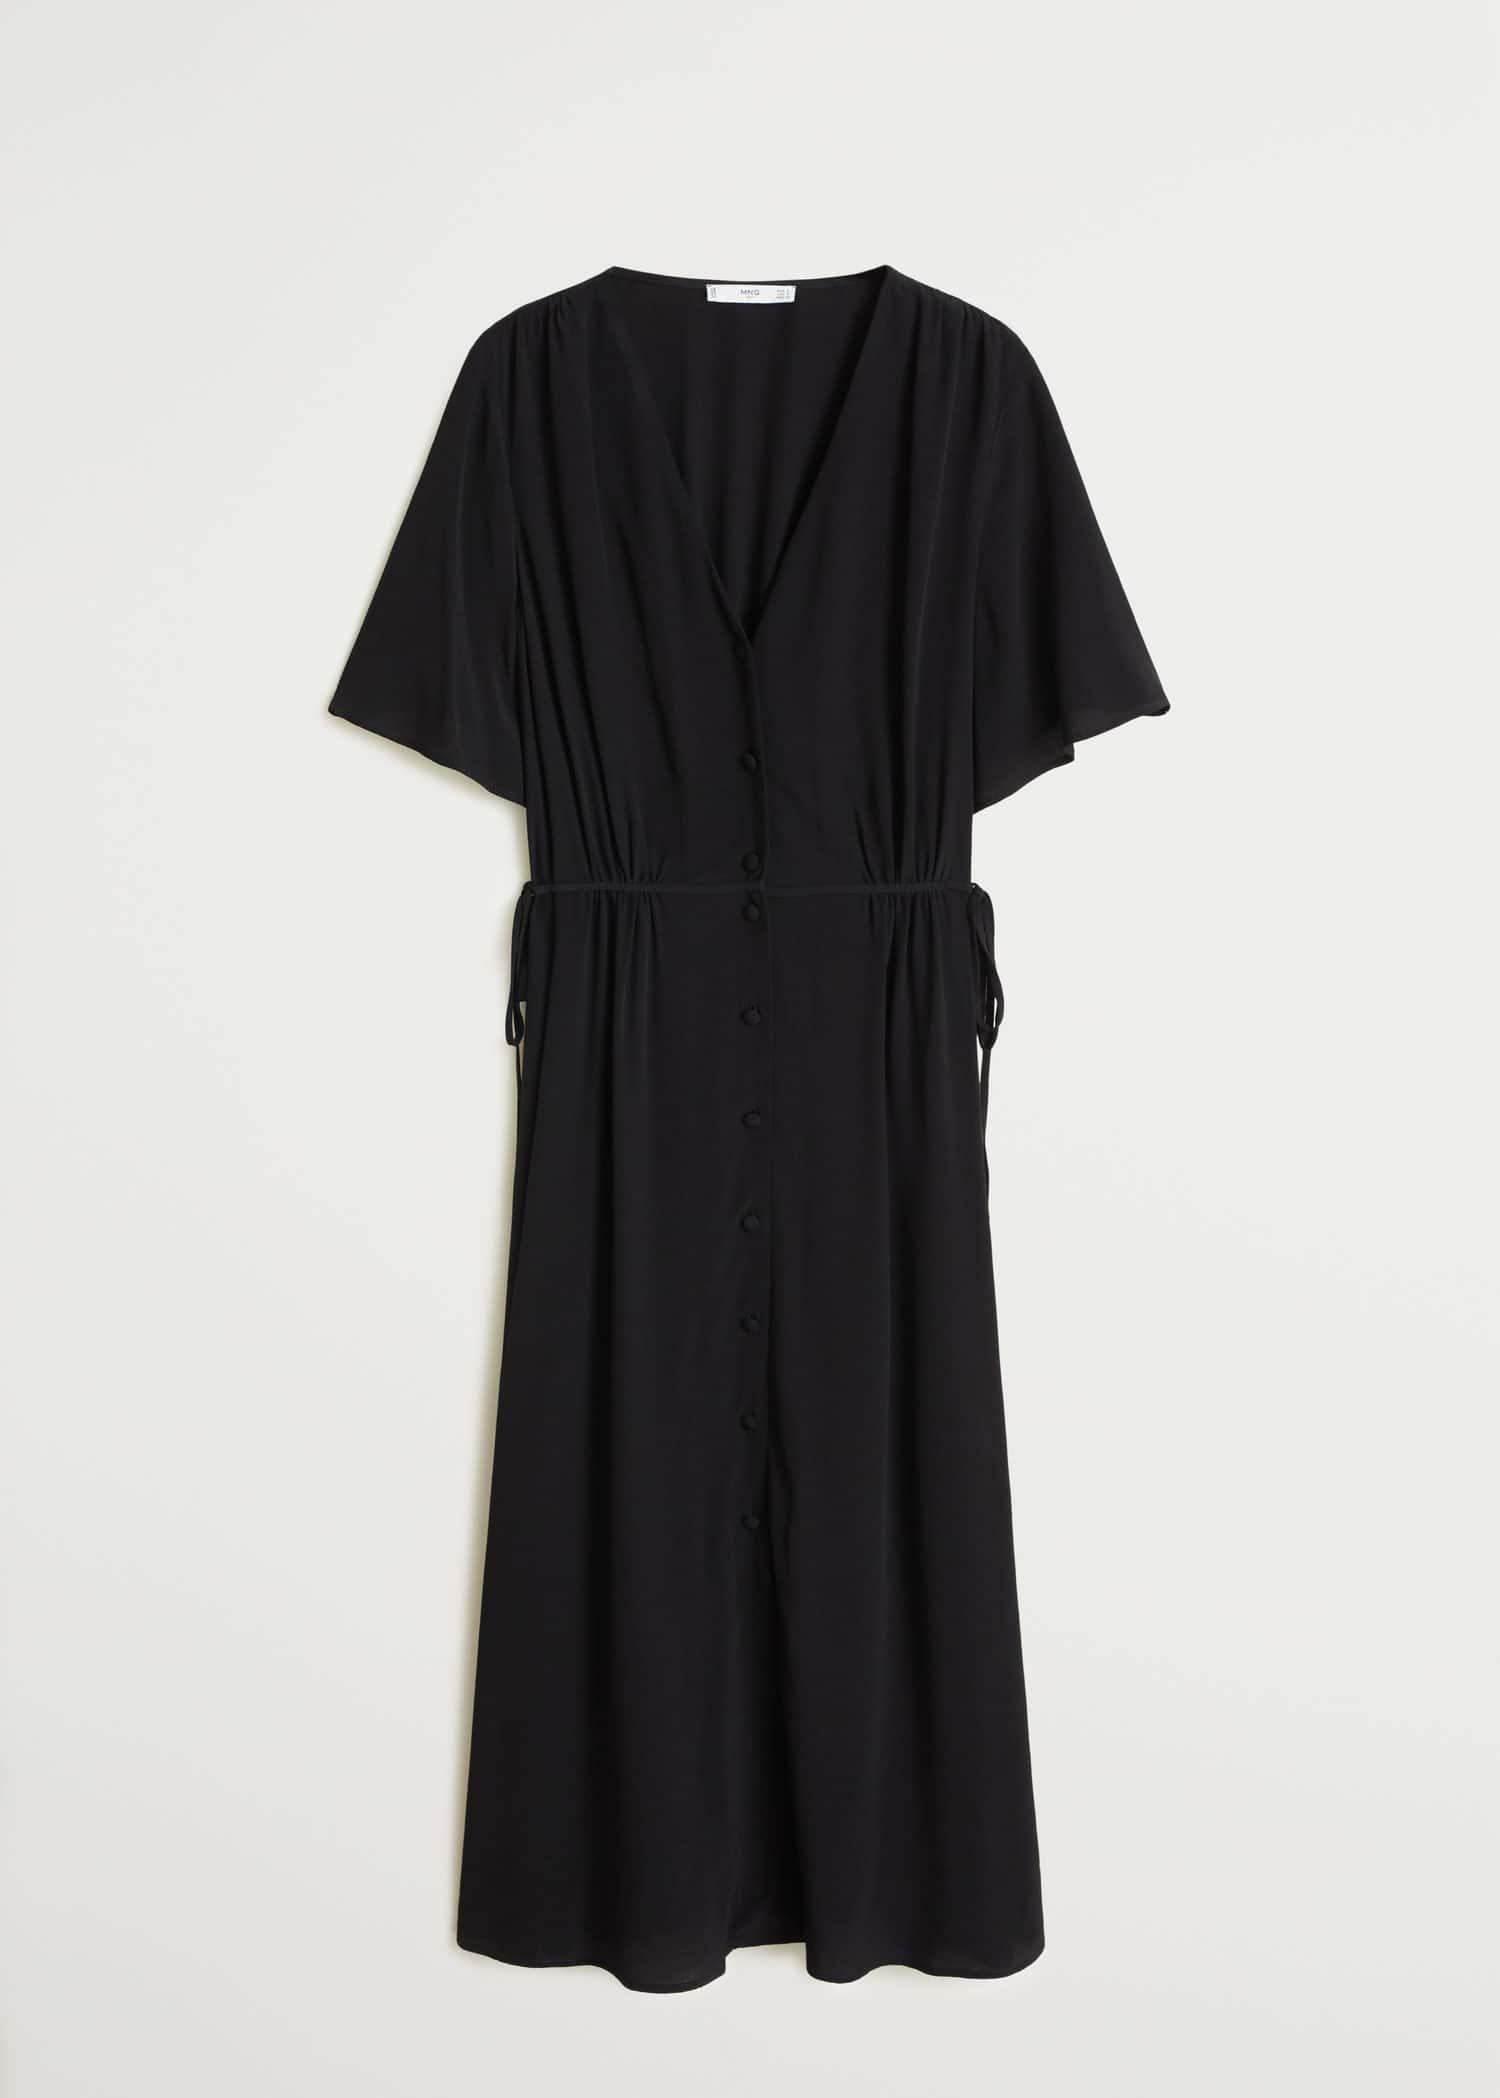 minimum Leder jacke, Minimum plissiertes midi kleid schwarz